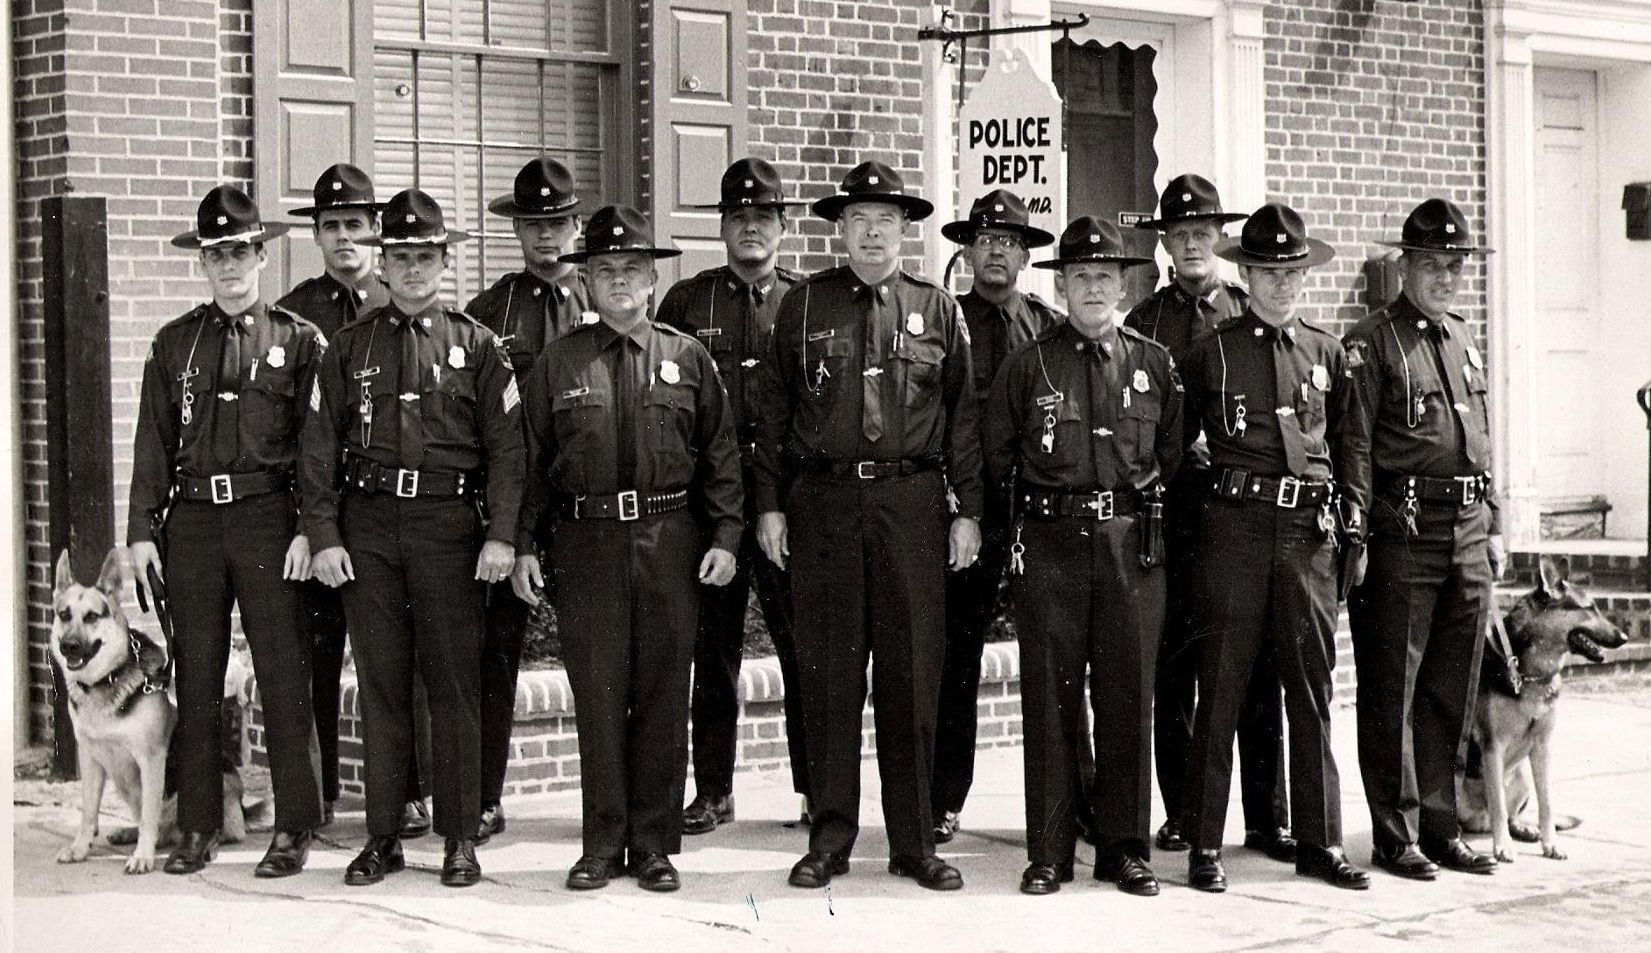 The Elkton Police Department, 1968 Law enforcement